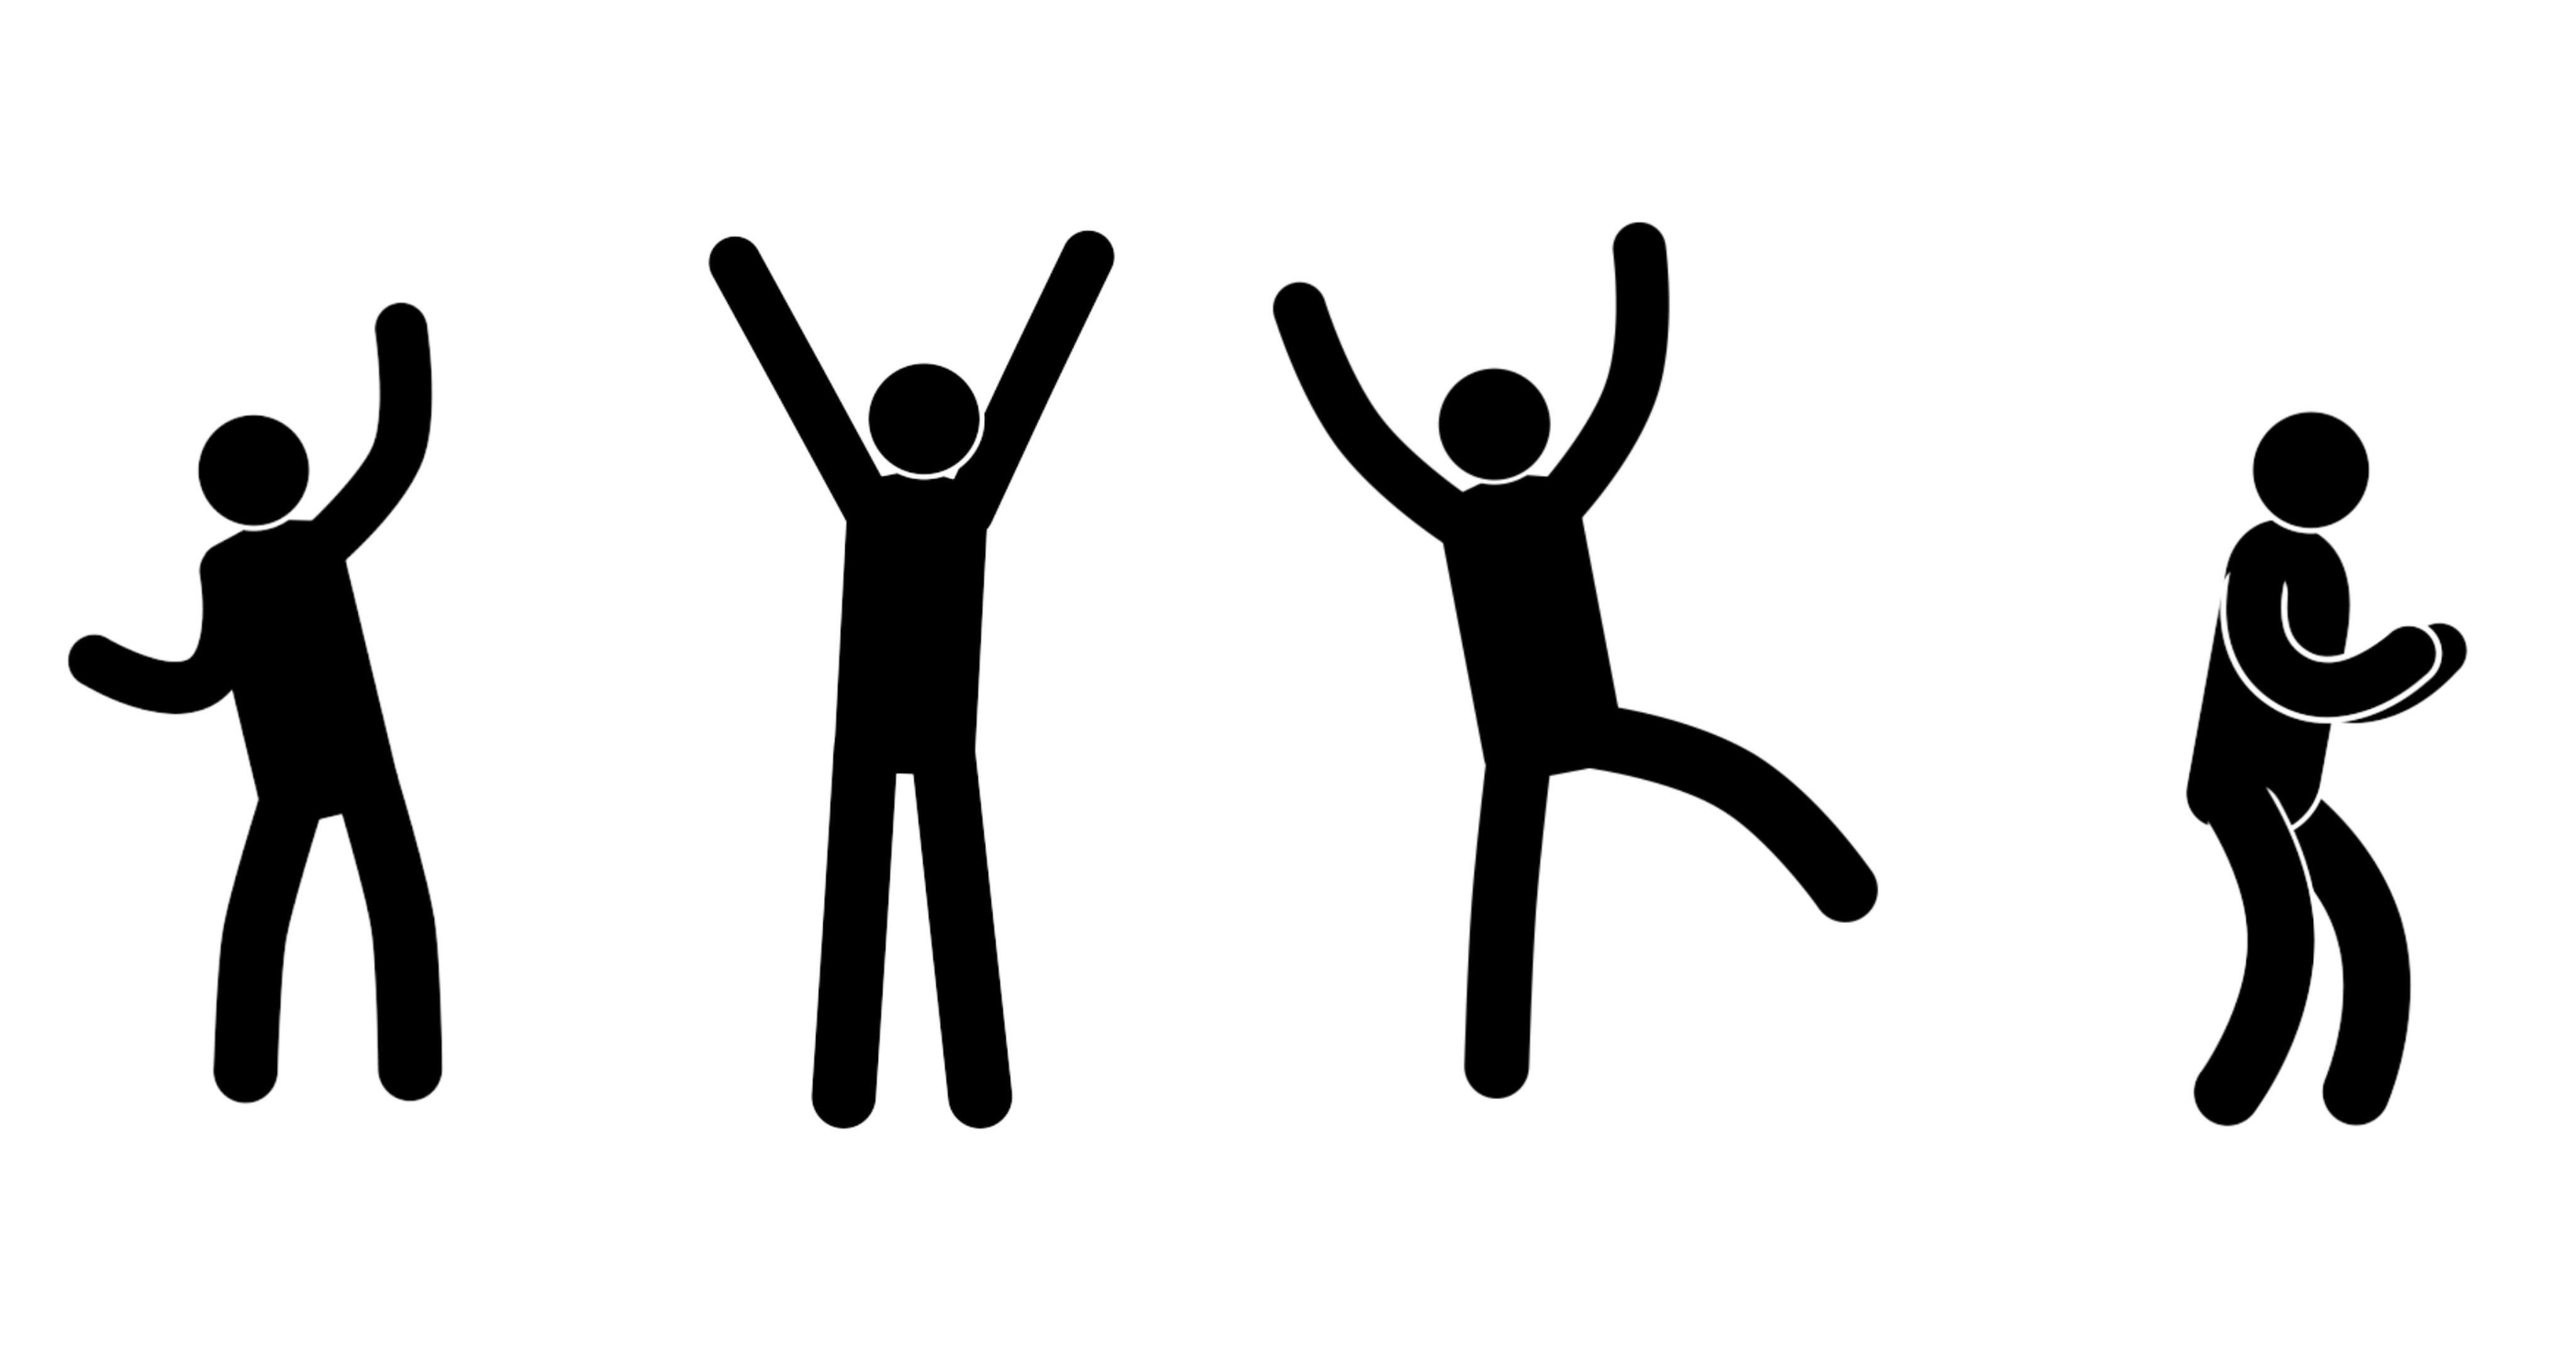 Pictograms people express their joy, success, achievement